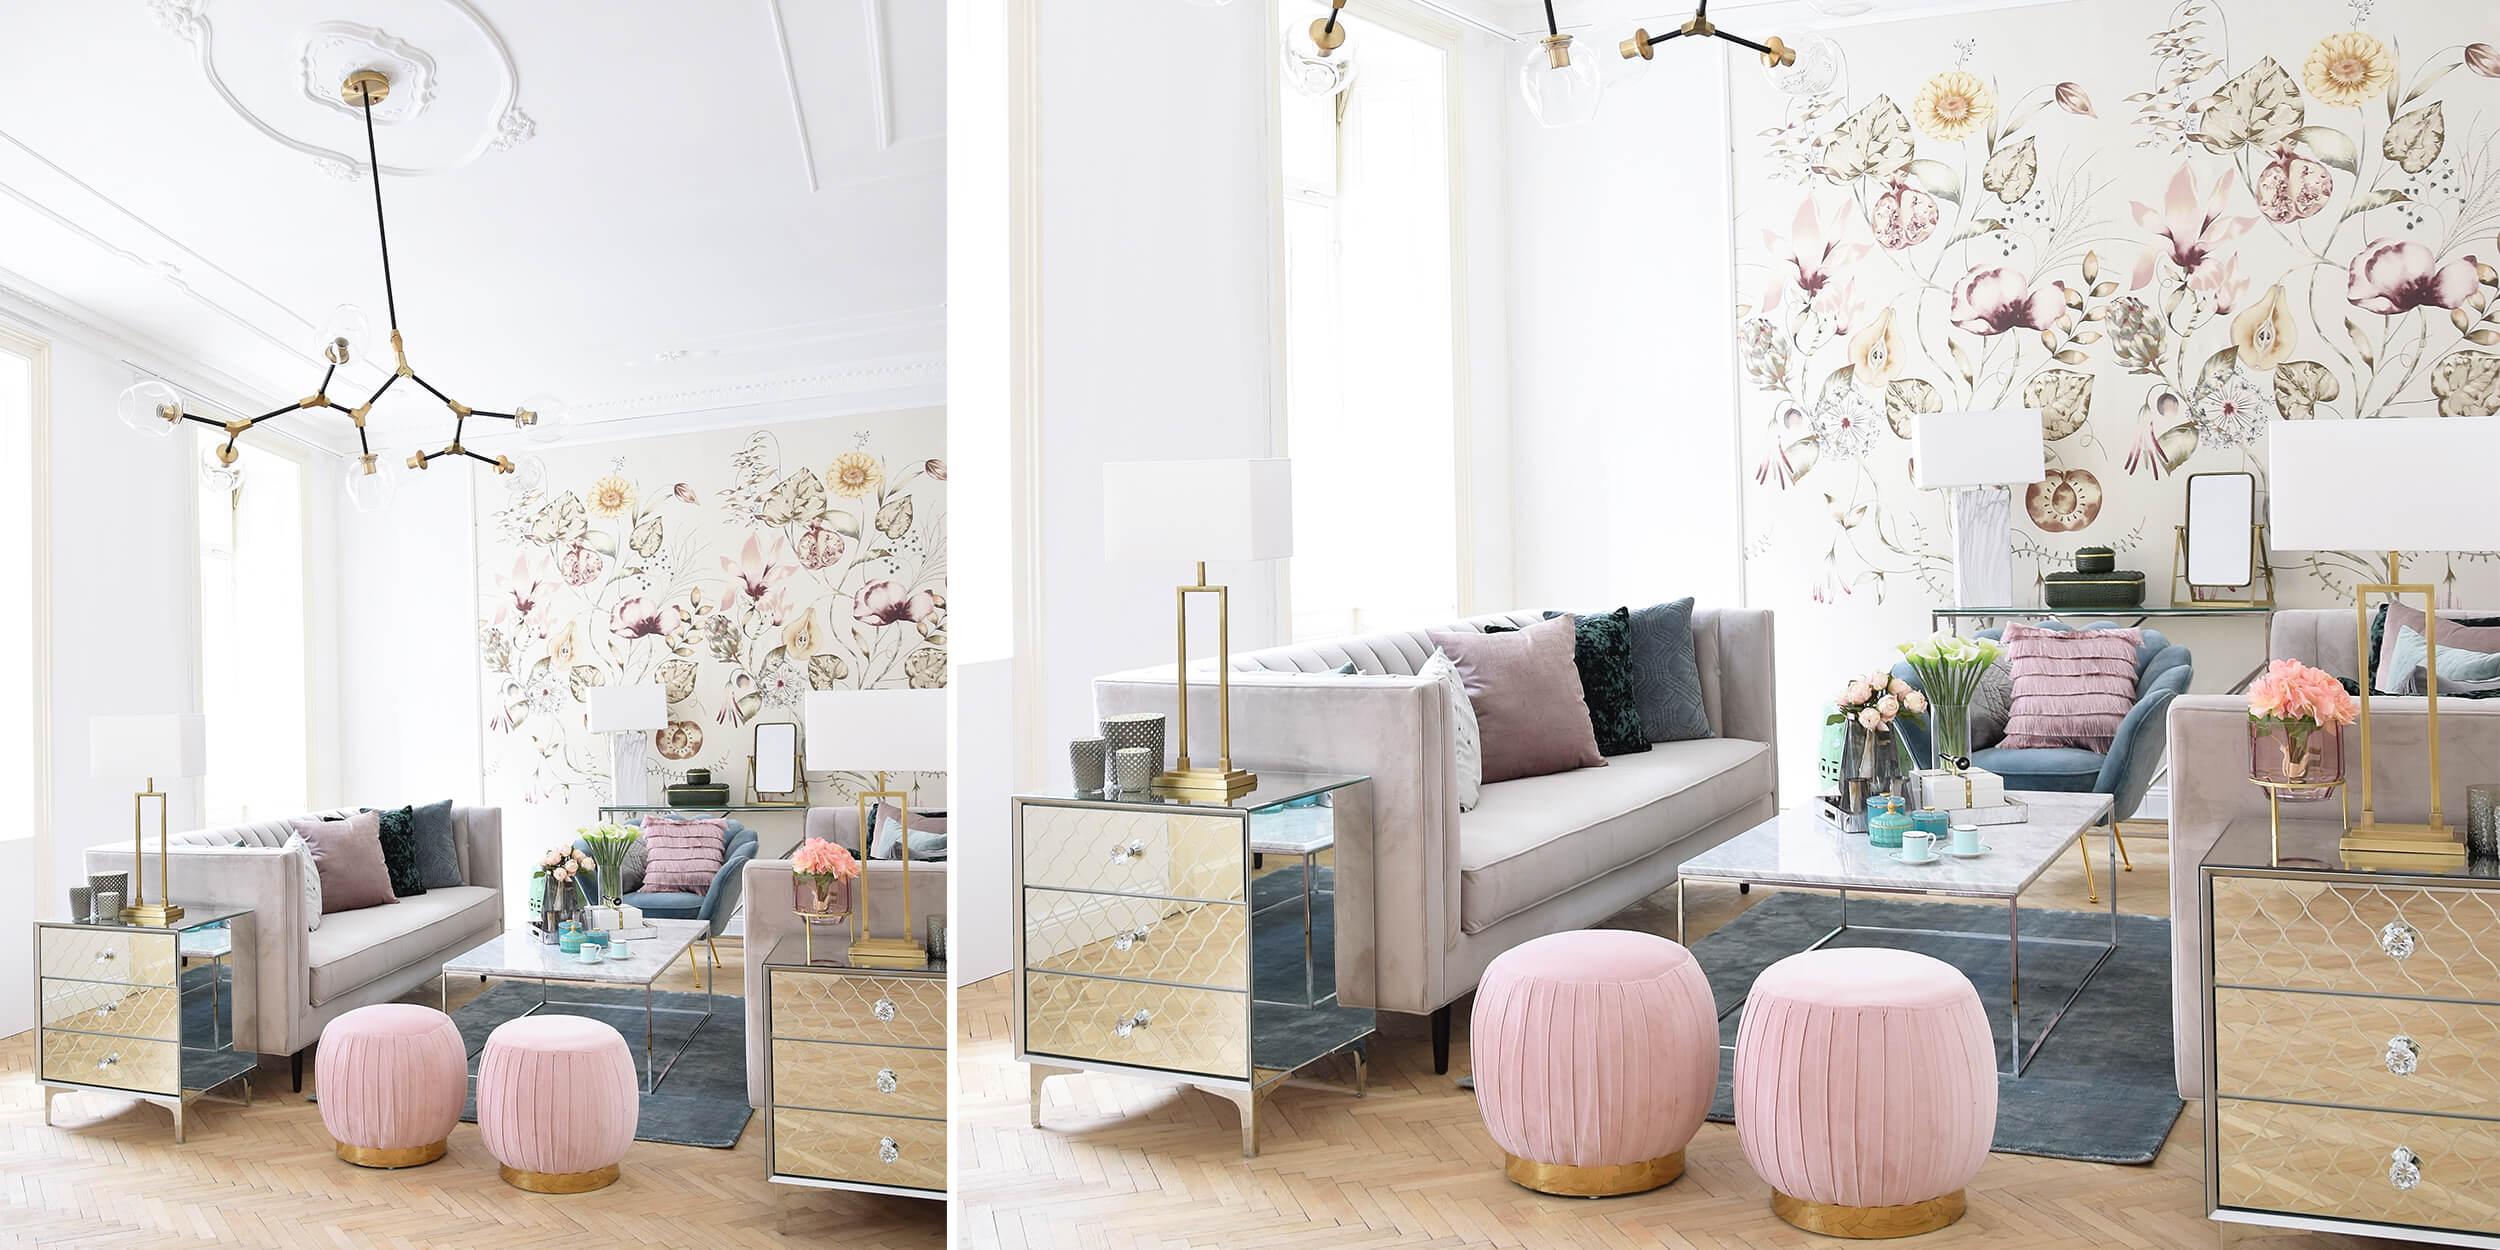 trendig in Samt! Sofa, Muschelsessel & Pouf